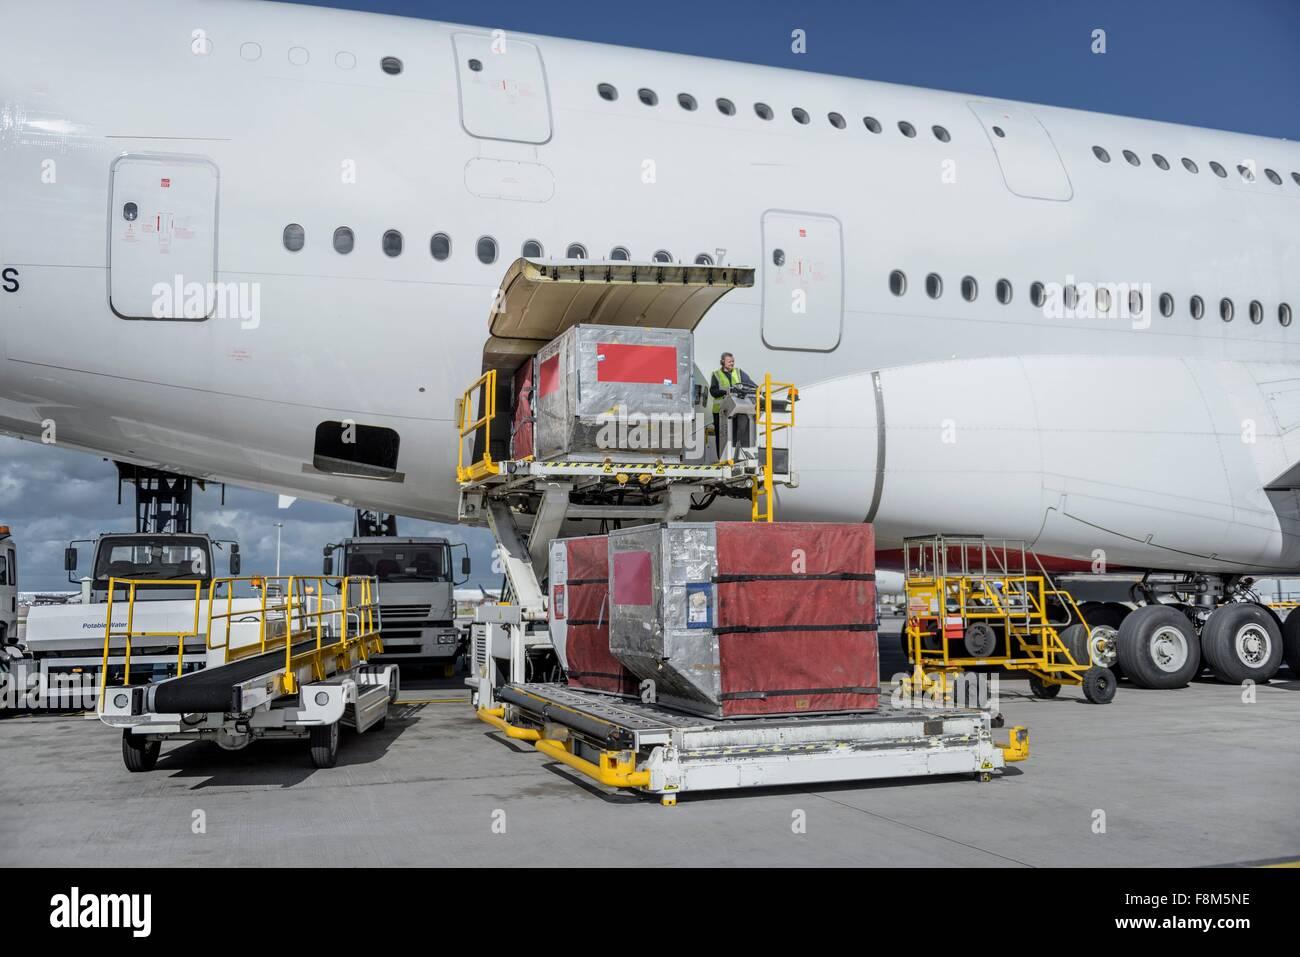 Bodenpersonal laden Fracht und Gepäck in den A380-Flugzeuge Stockbild